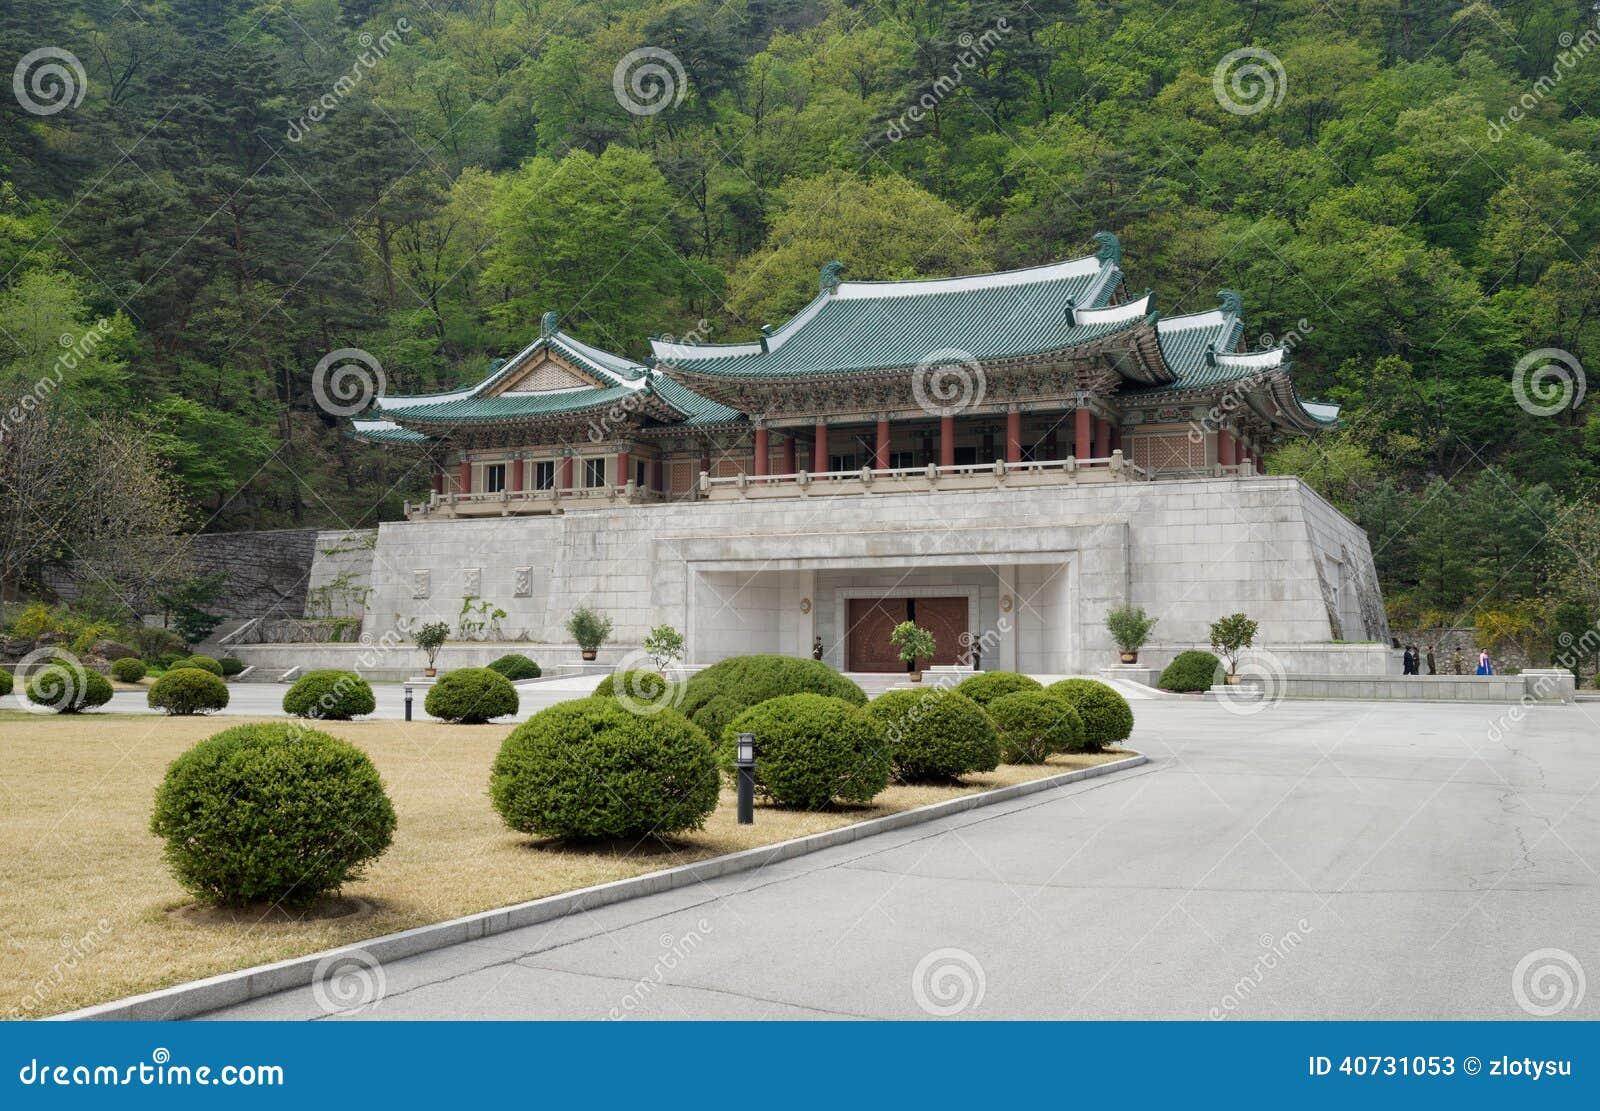 International Friendship Exhibition centre in Myohyang, DPRK (North Korea)